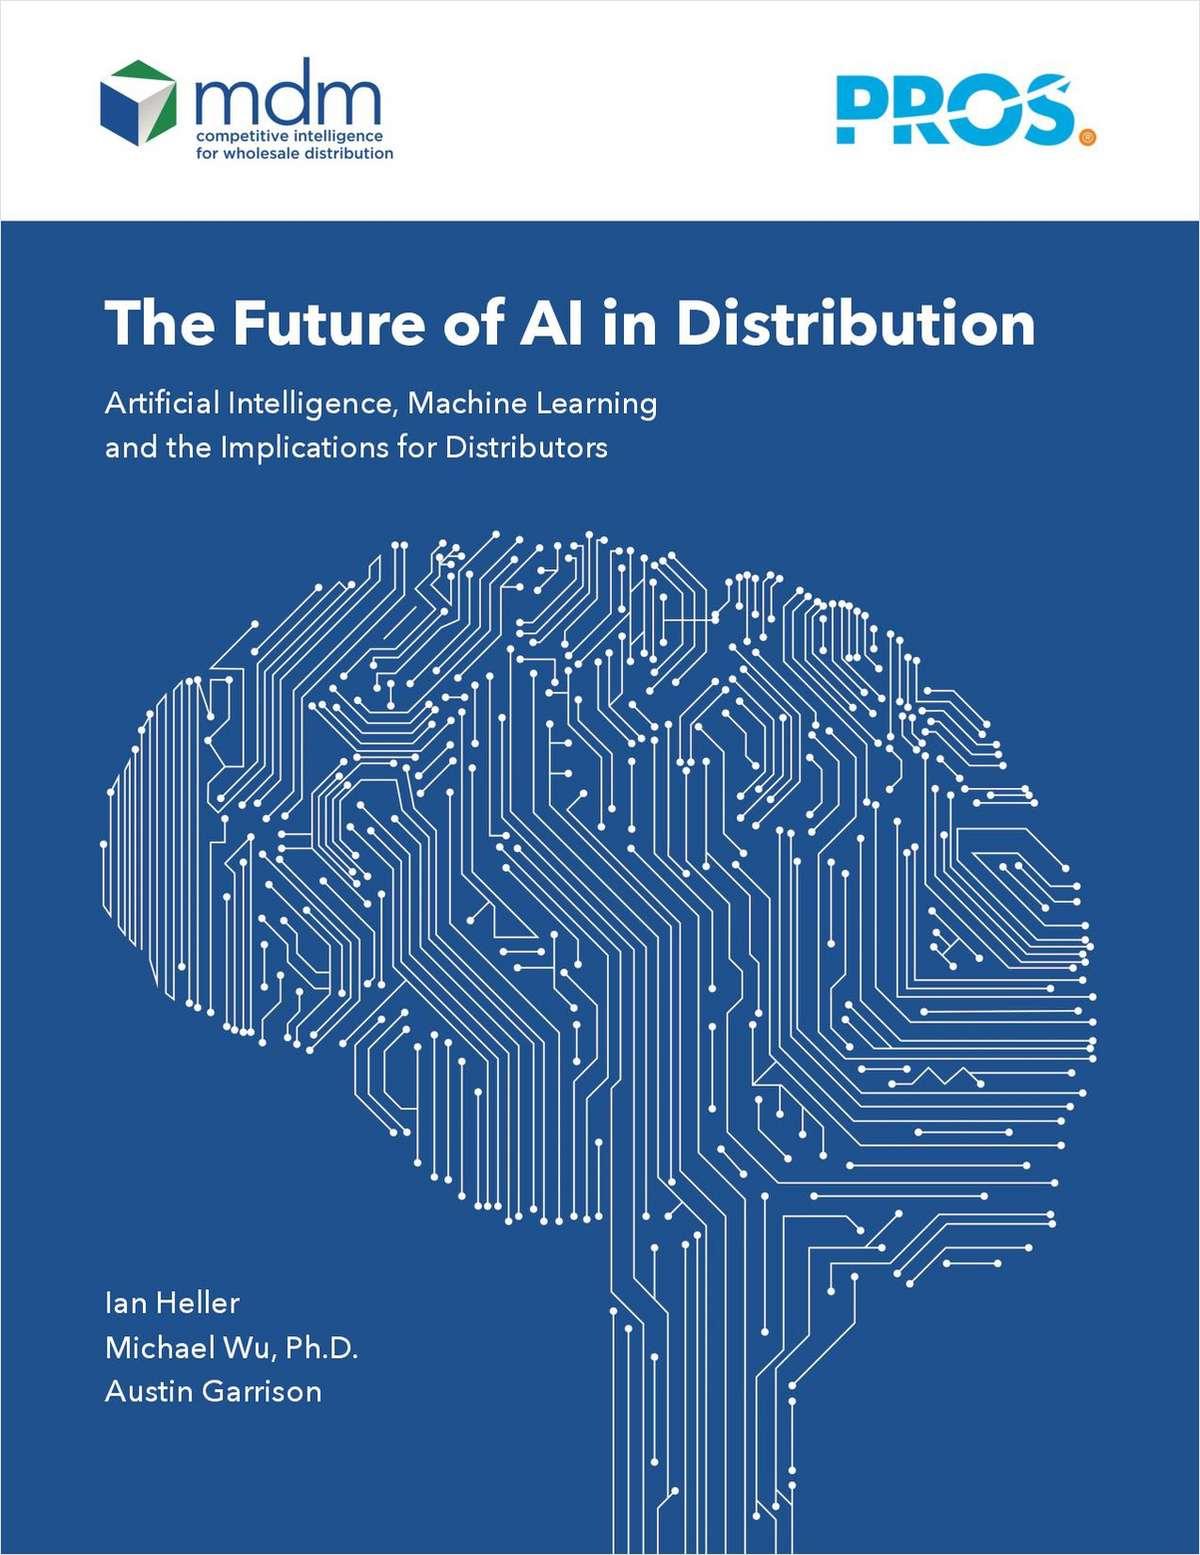 The Future of AI in Distribution